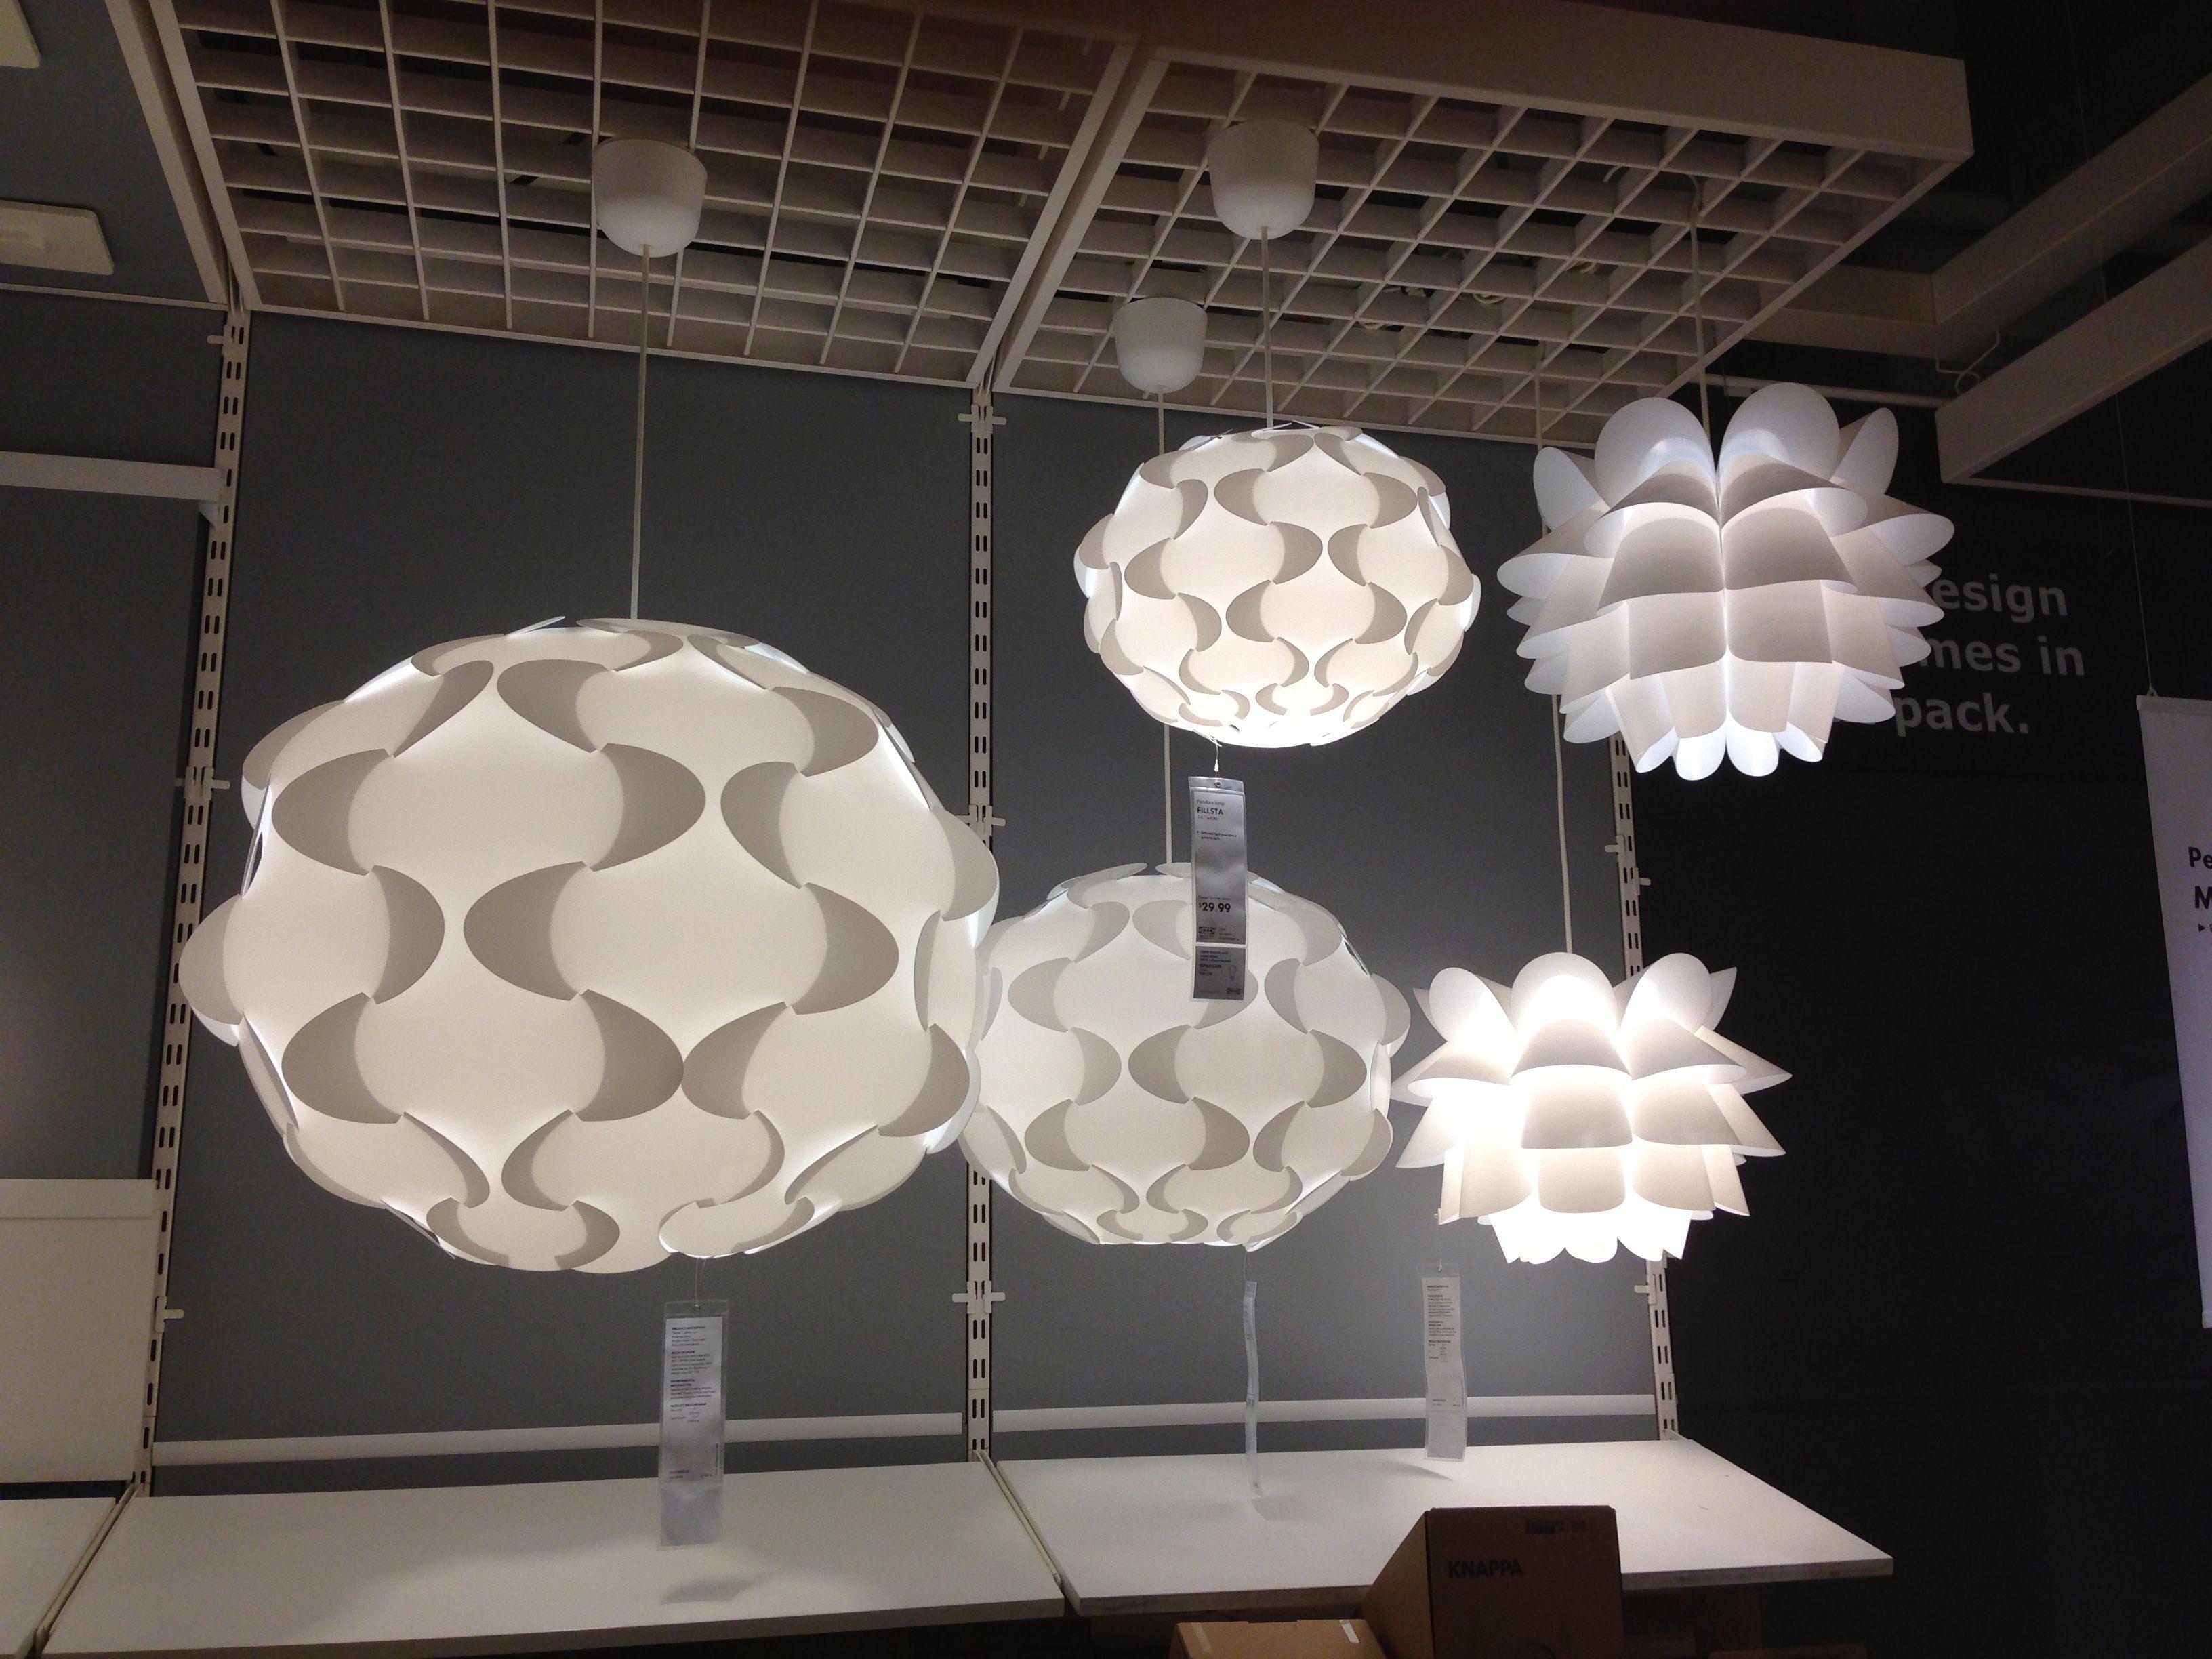 cool ikea lighting ideas | IKEA lights....they do have a really cool lighting ...